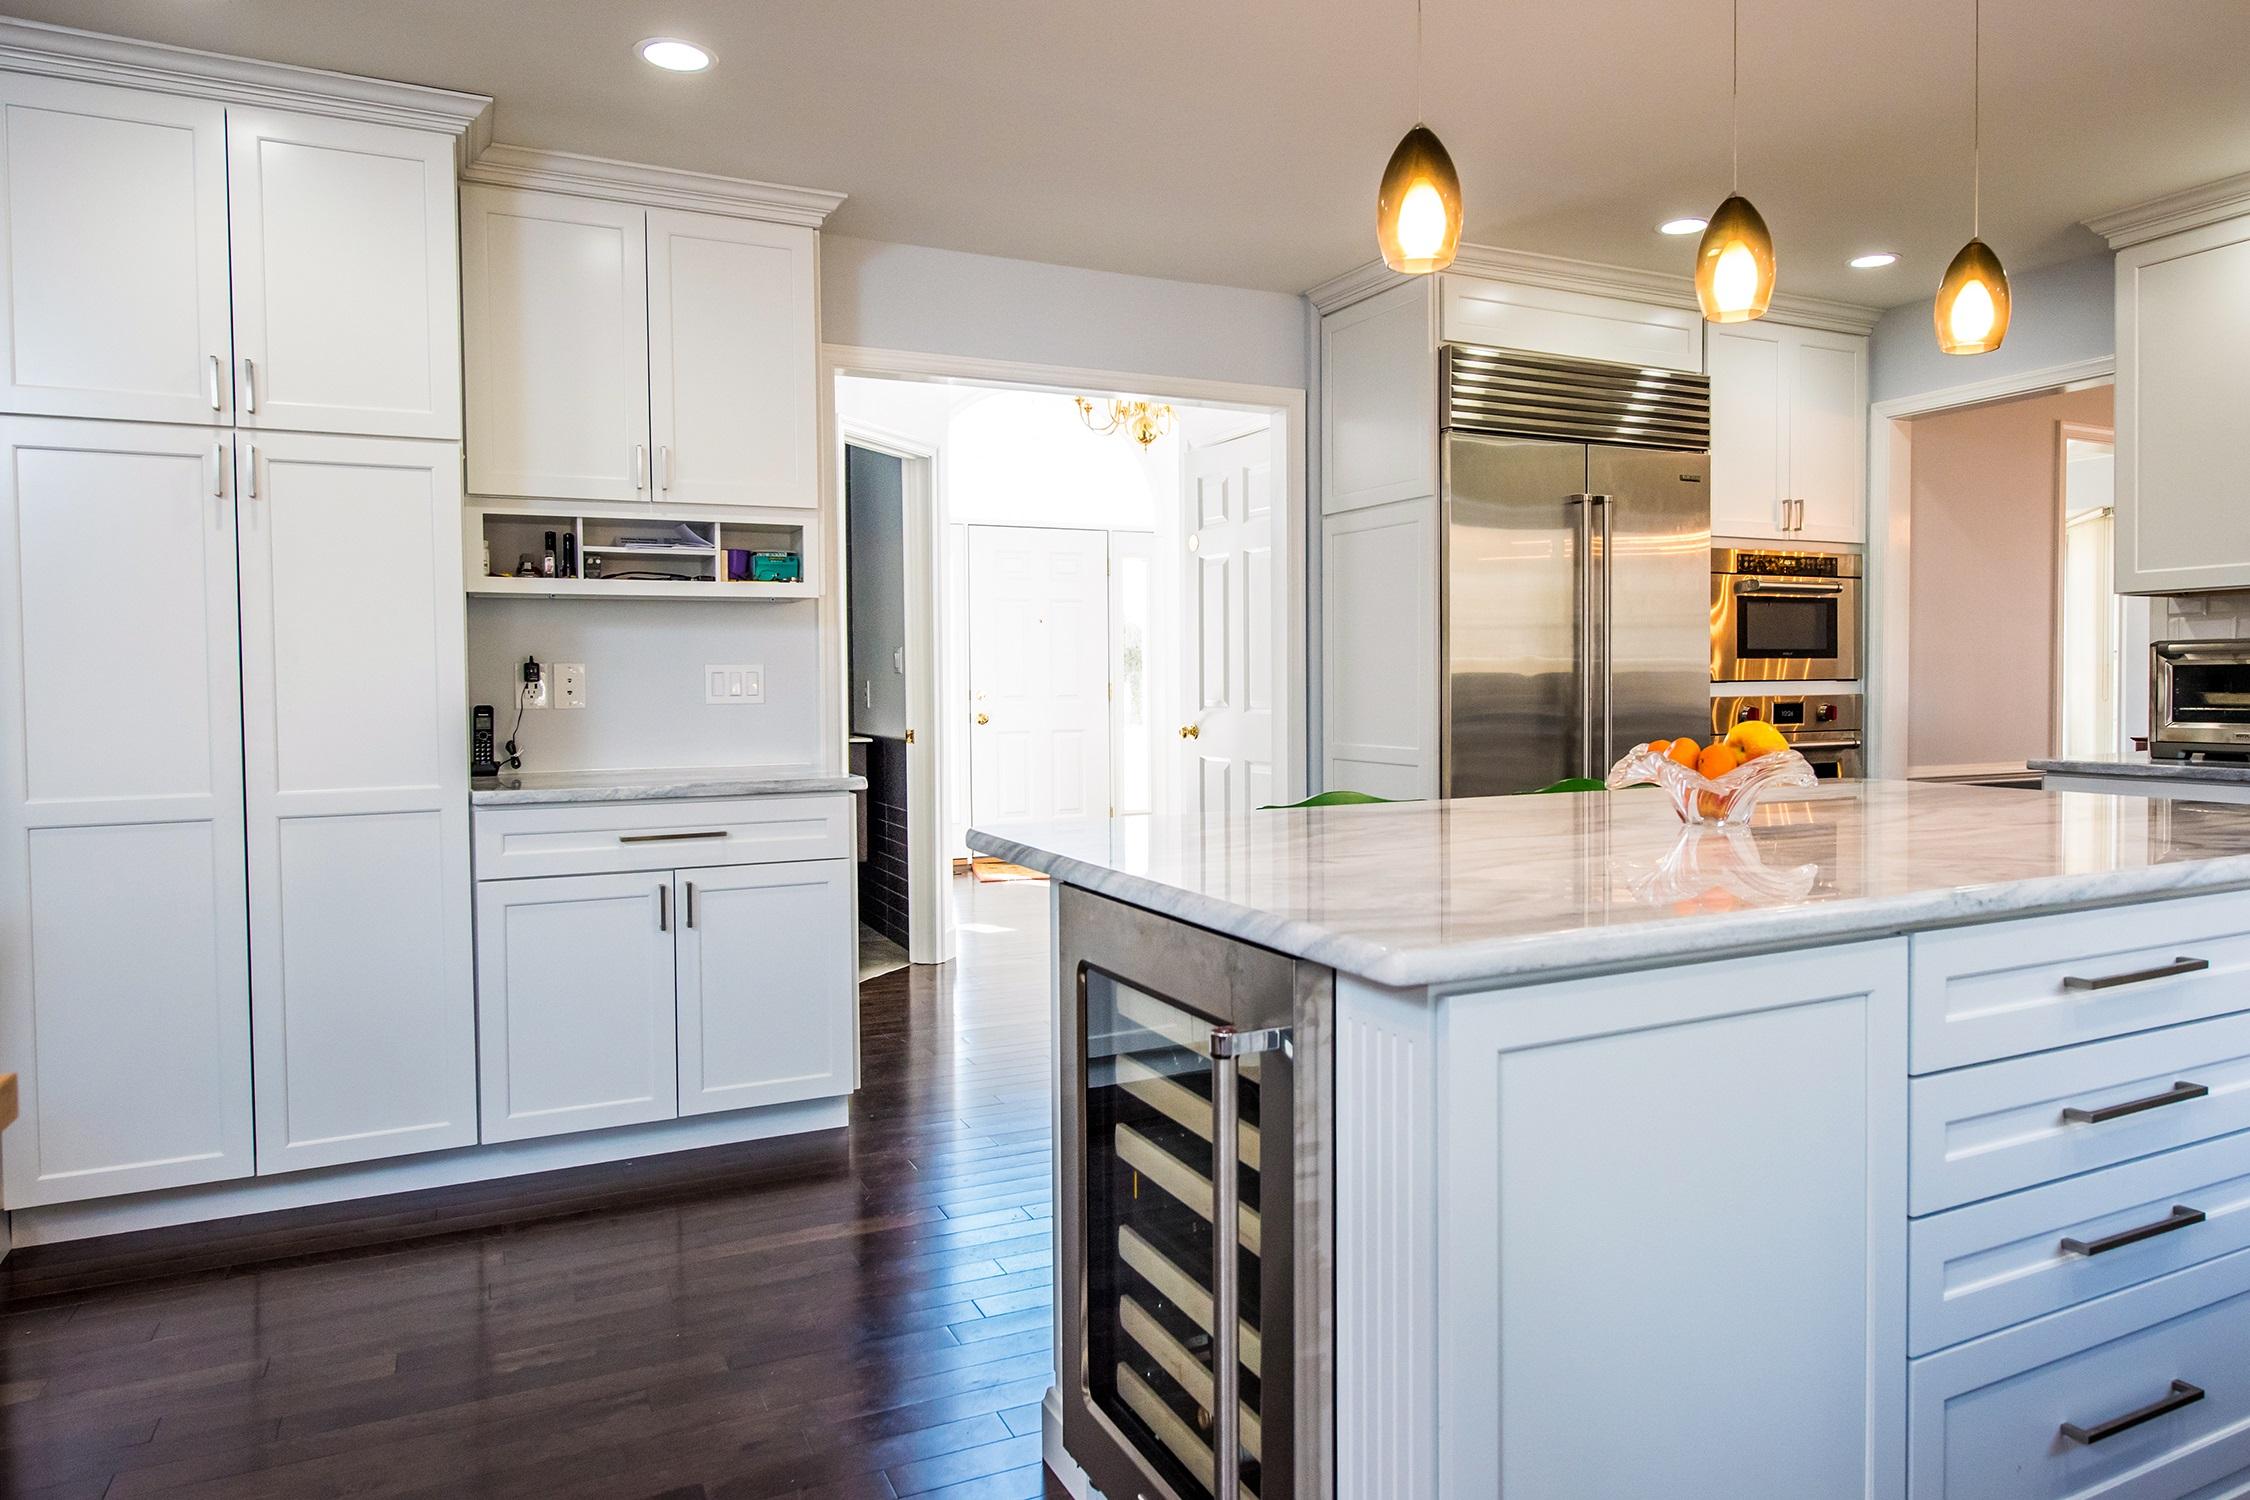 Kitchen Remodel Cartwright Way North Potomac Md 20878